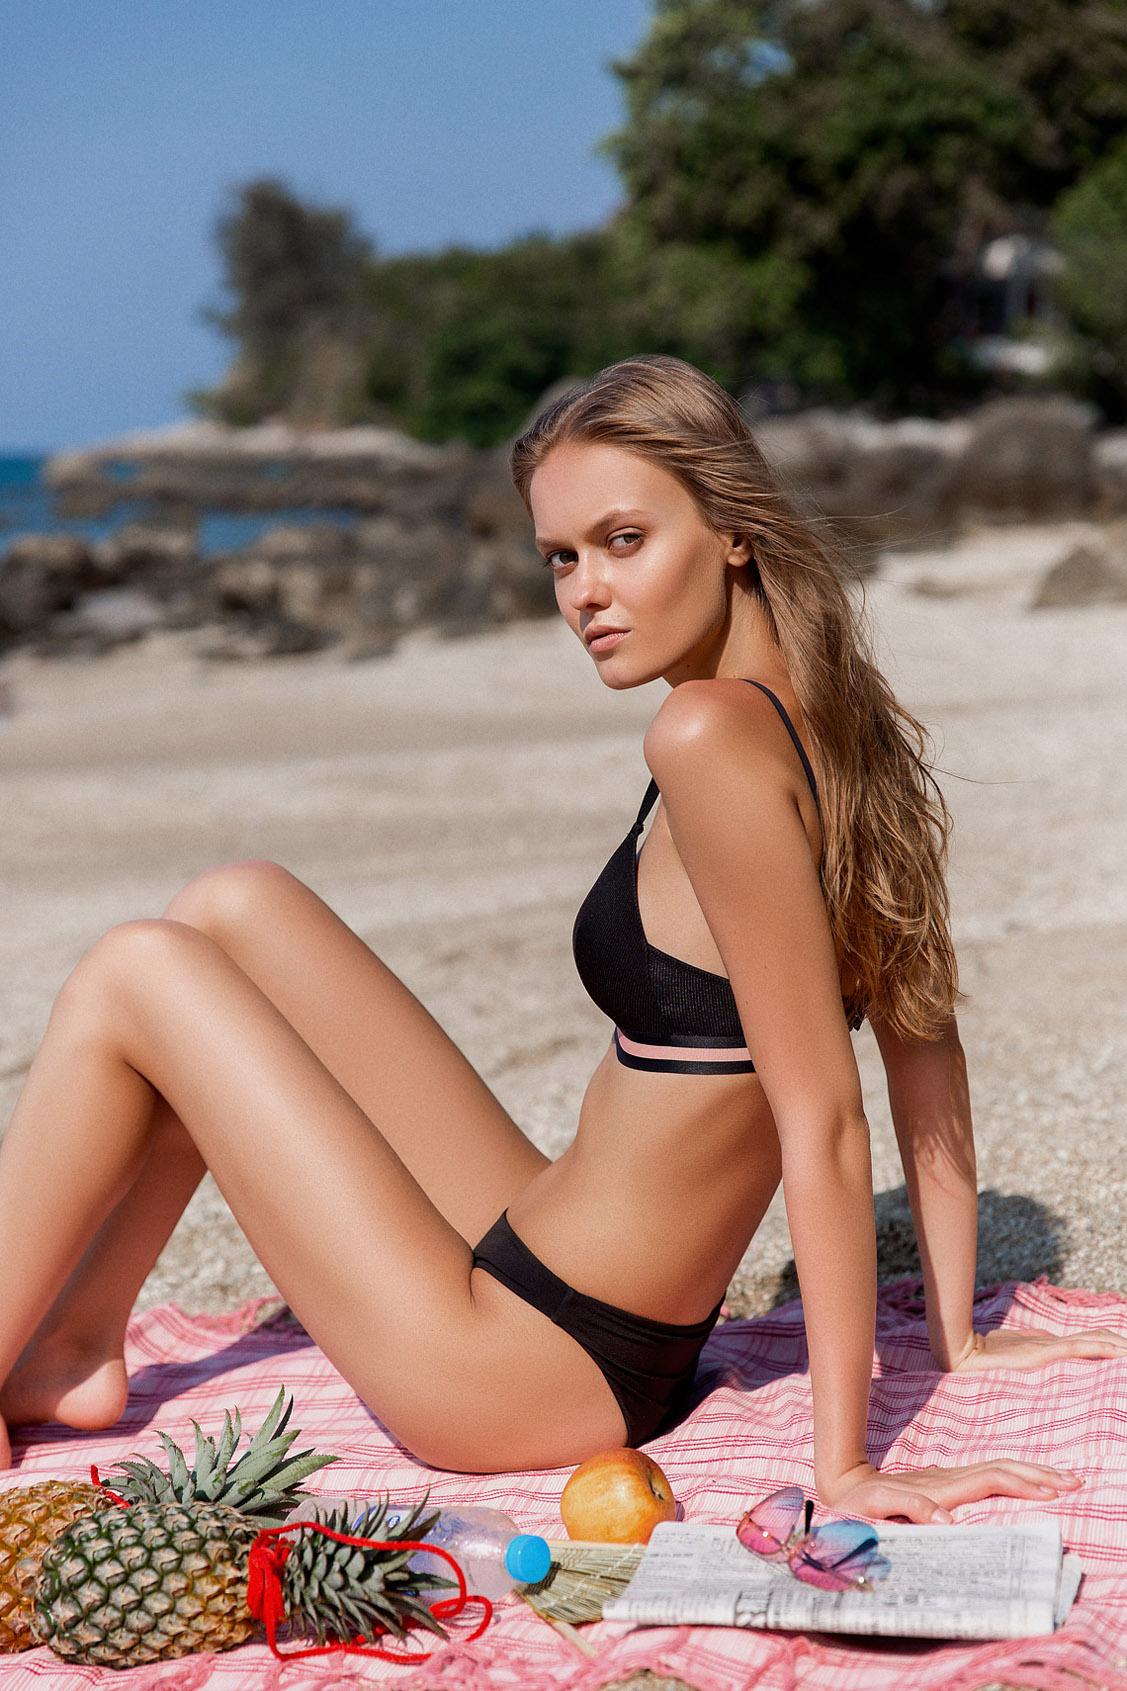 Отпуск на пляжах Пхукета / Alessia Merz by Ilya Bukowski / Yume Magazine